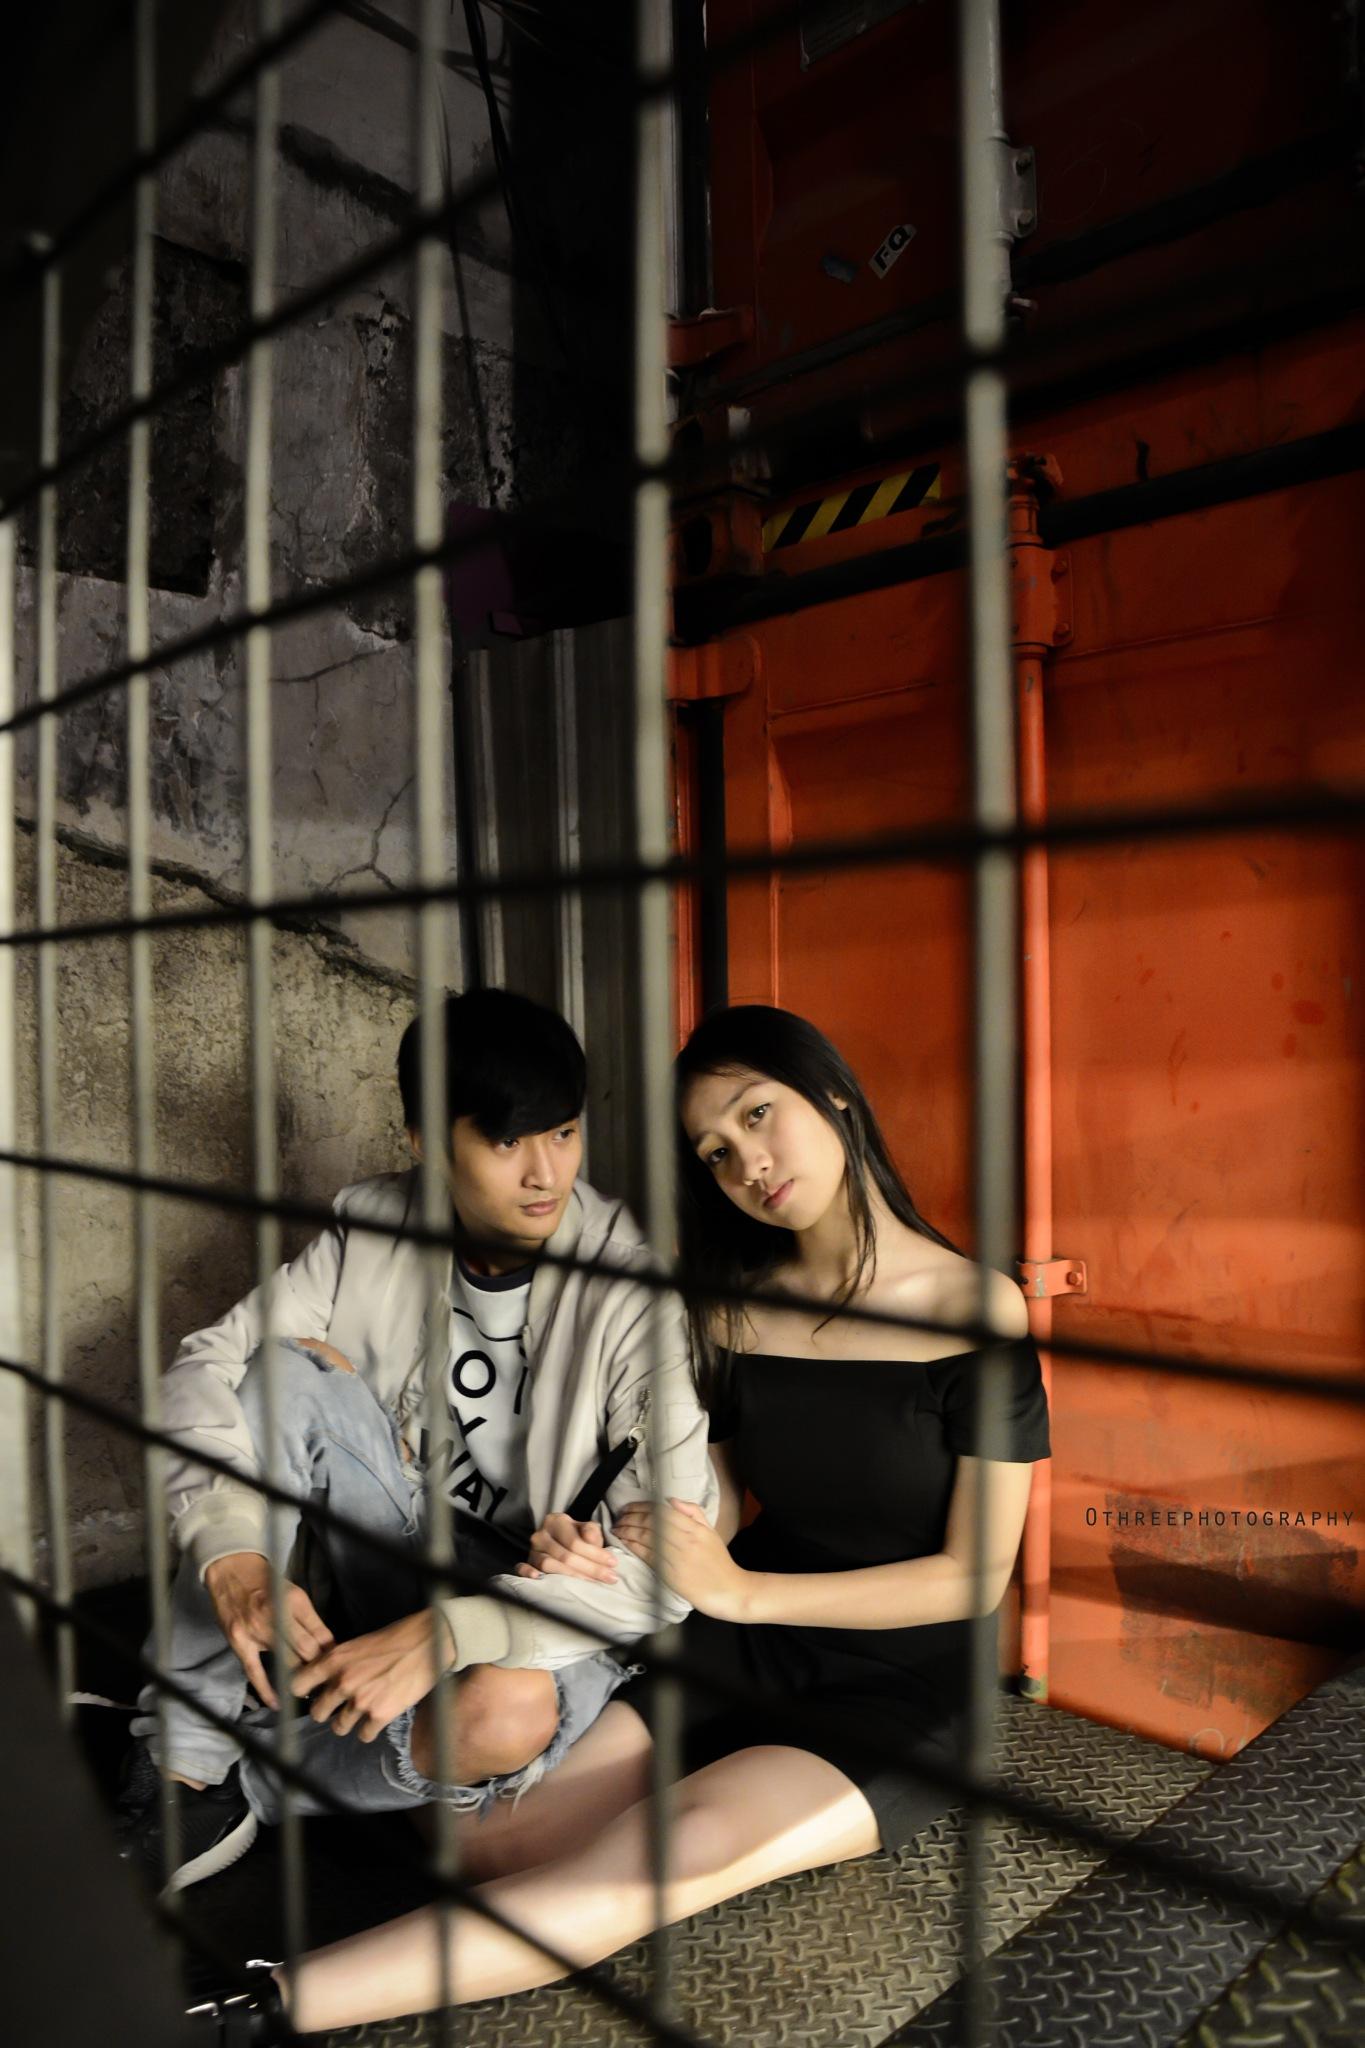 Love in Prison by Putri Solehah Sumarno